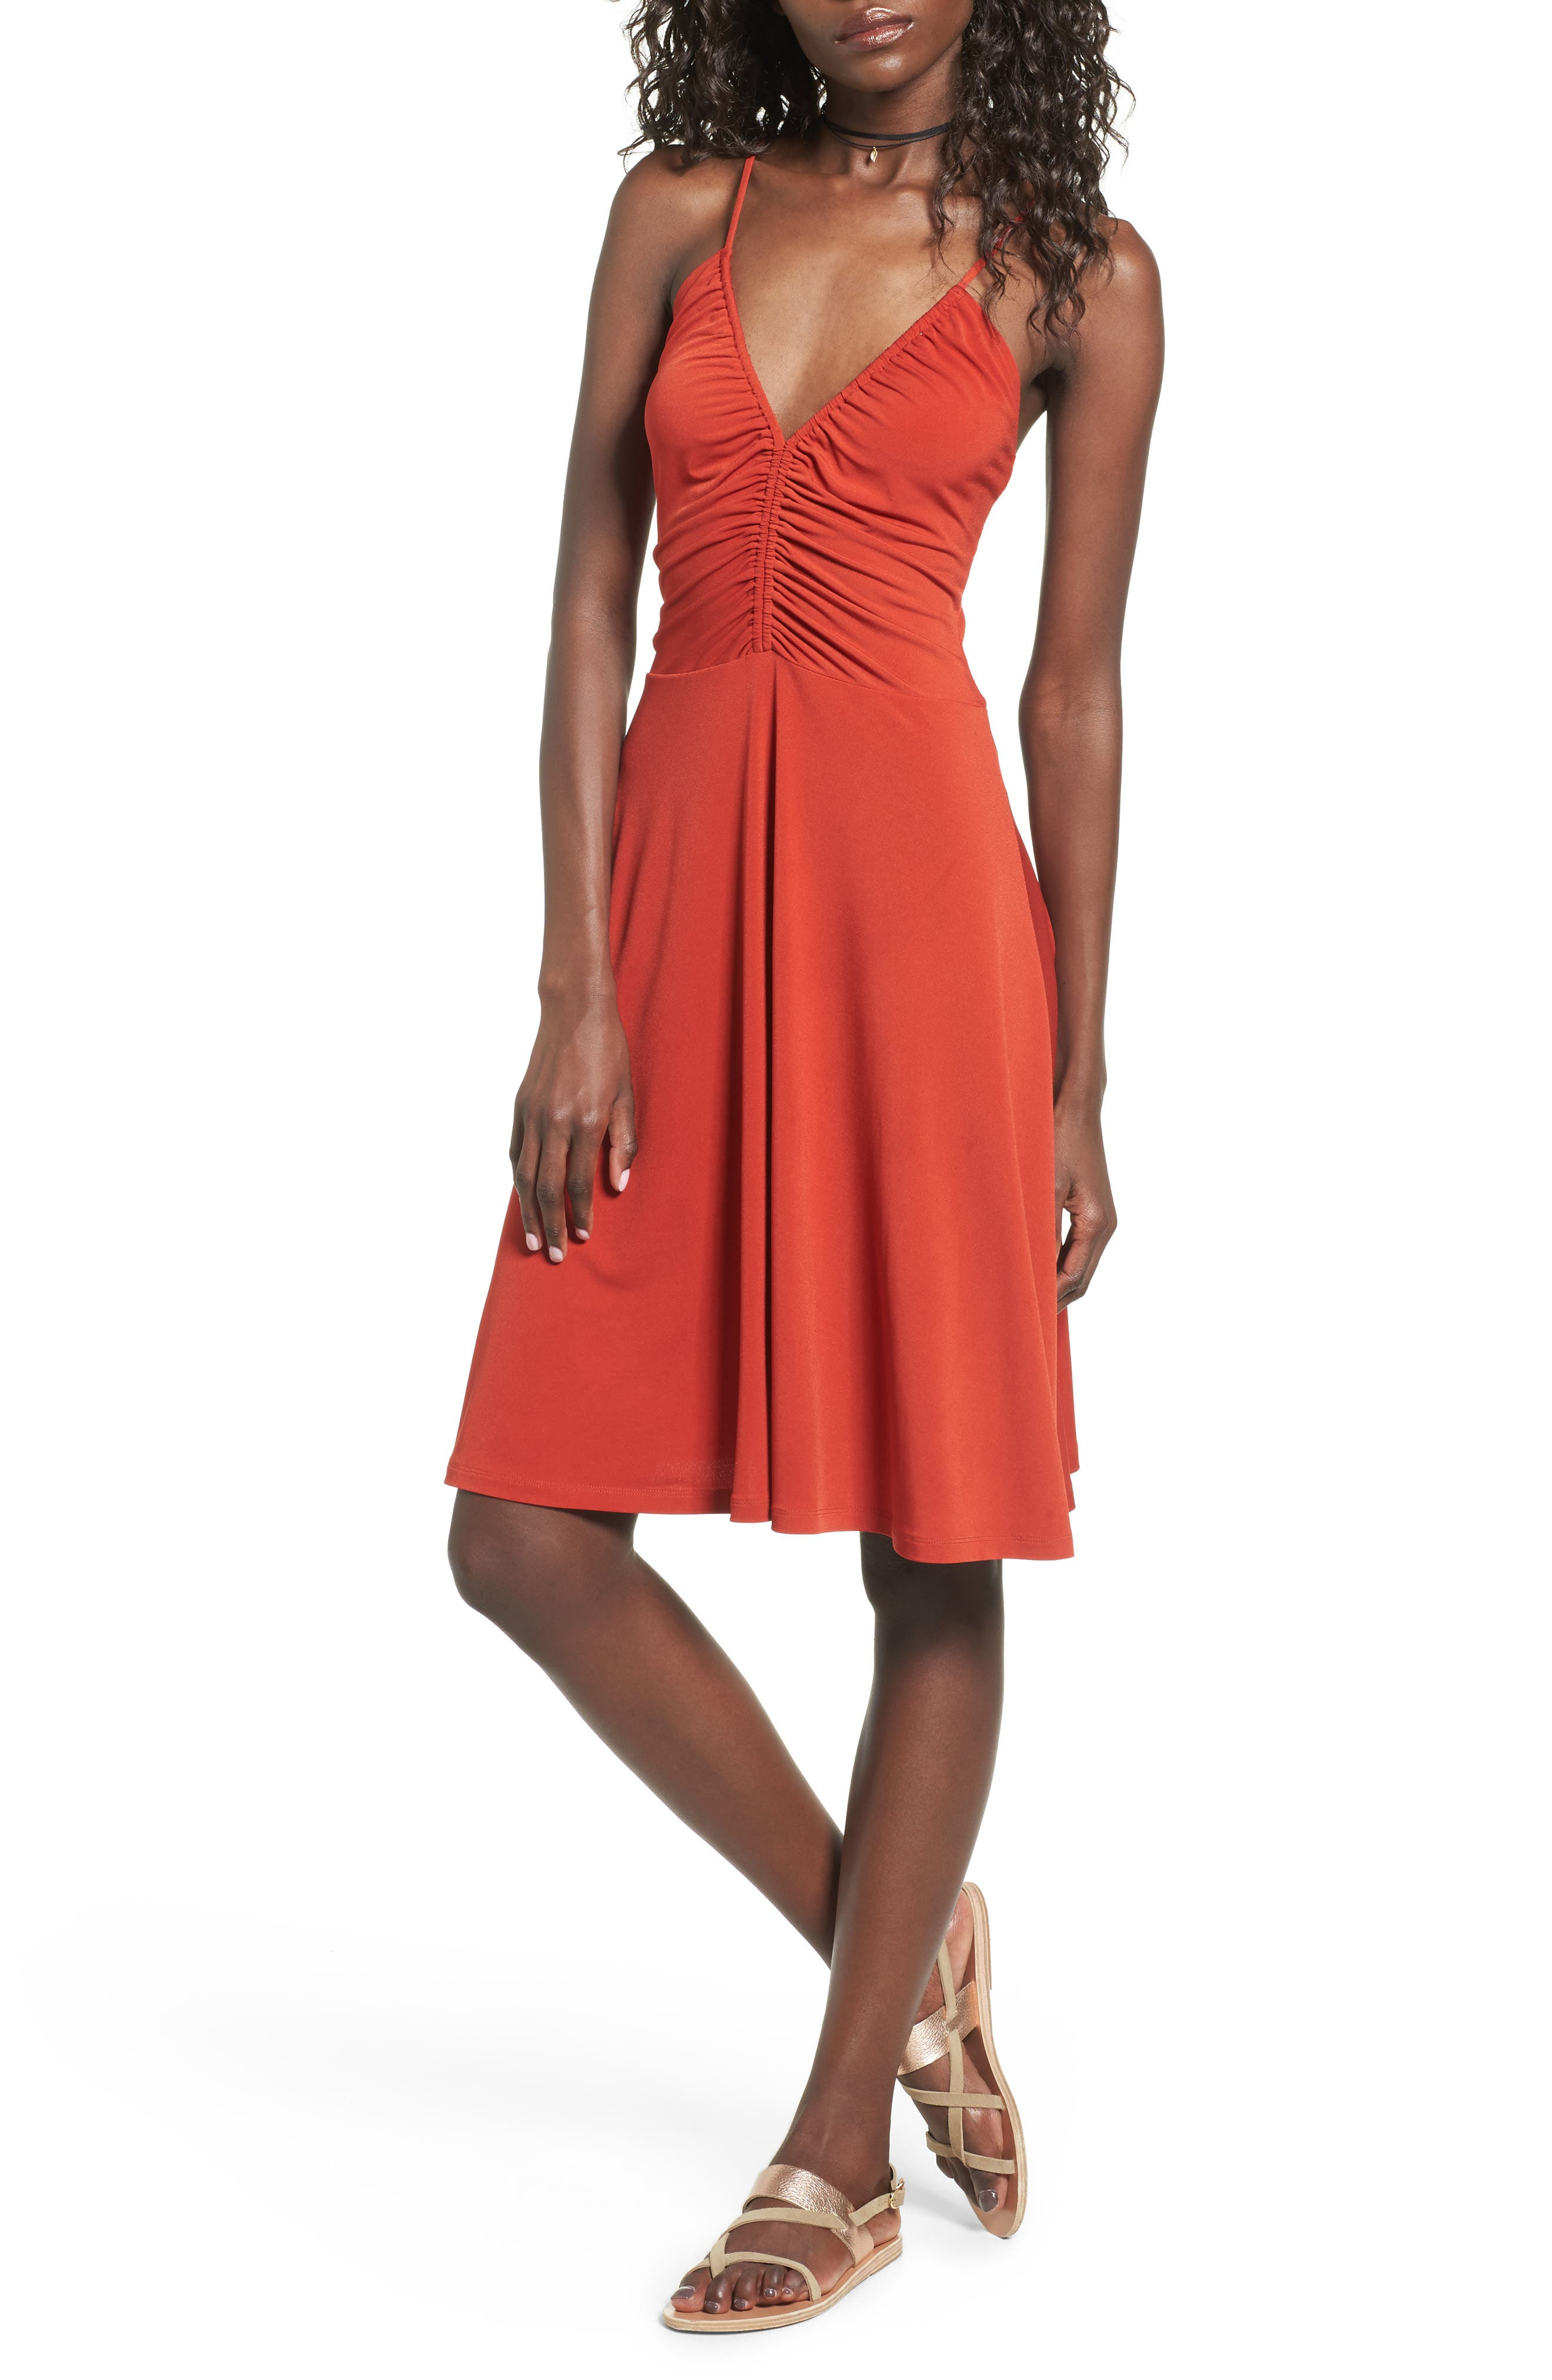 Cinch Front Dress,                             Main thumbnail 1, color,                             610